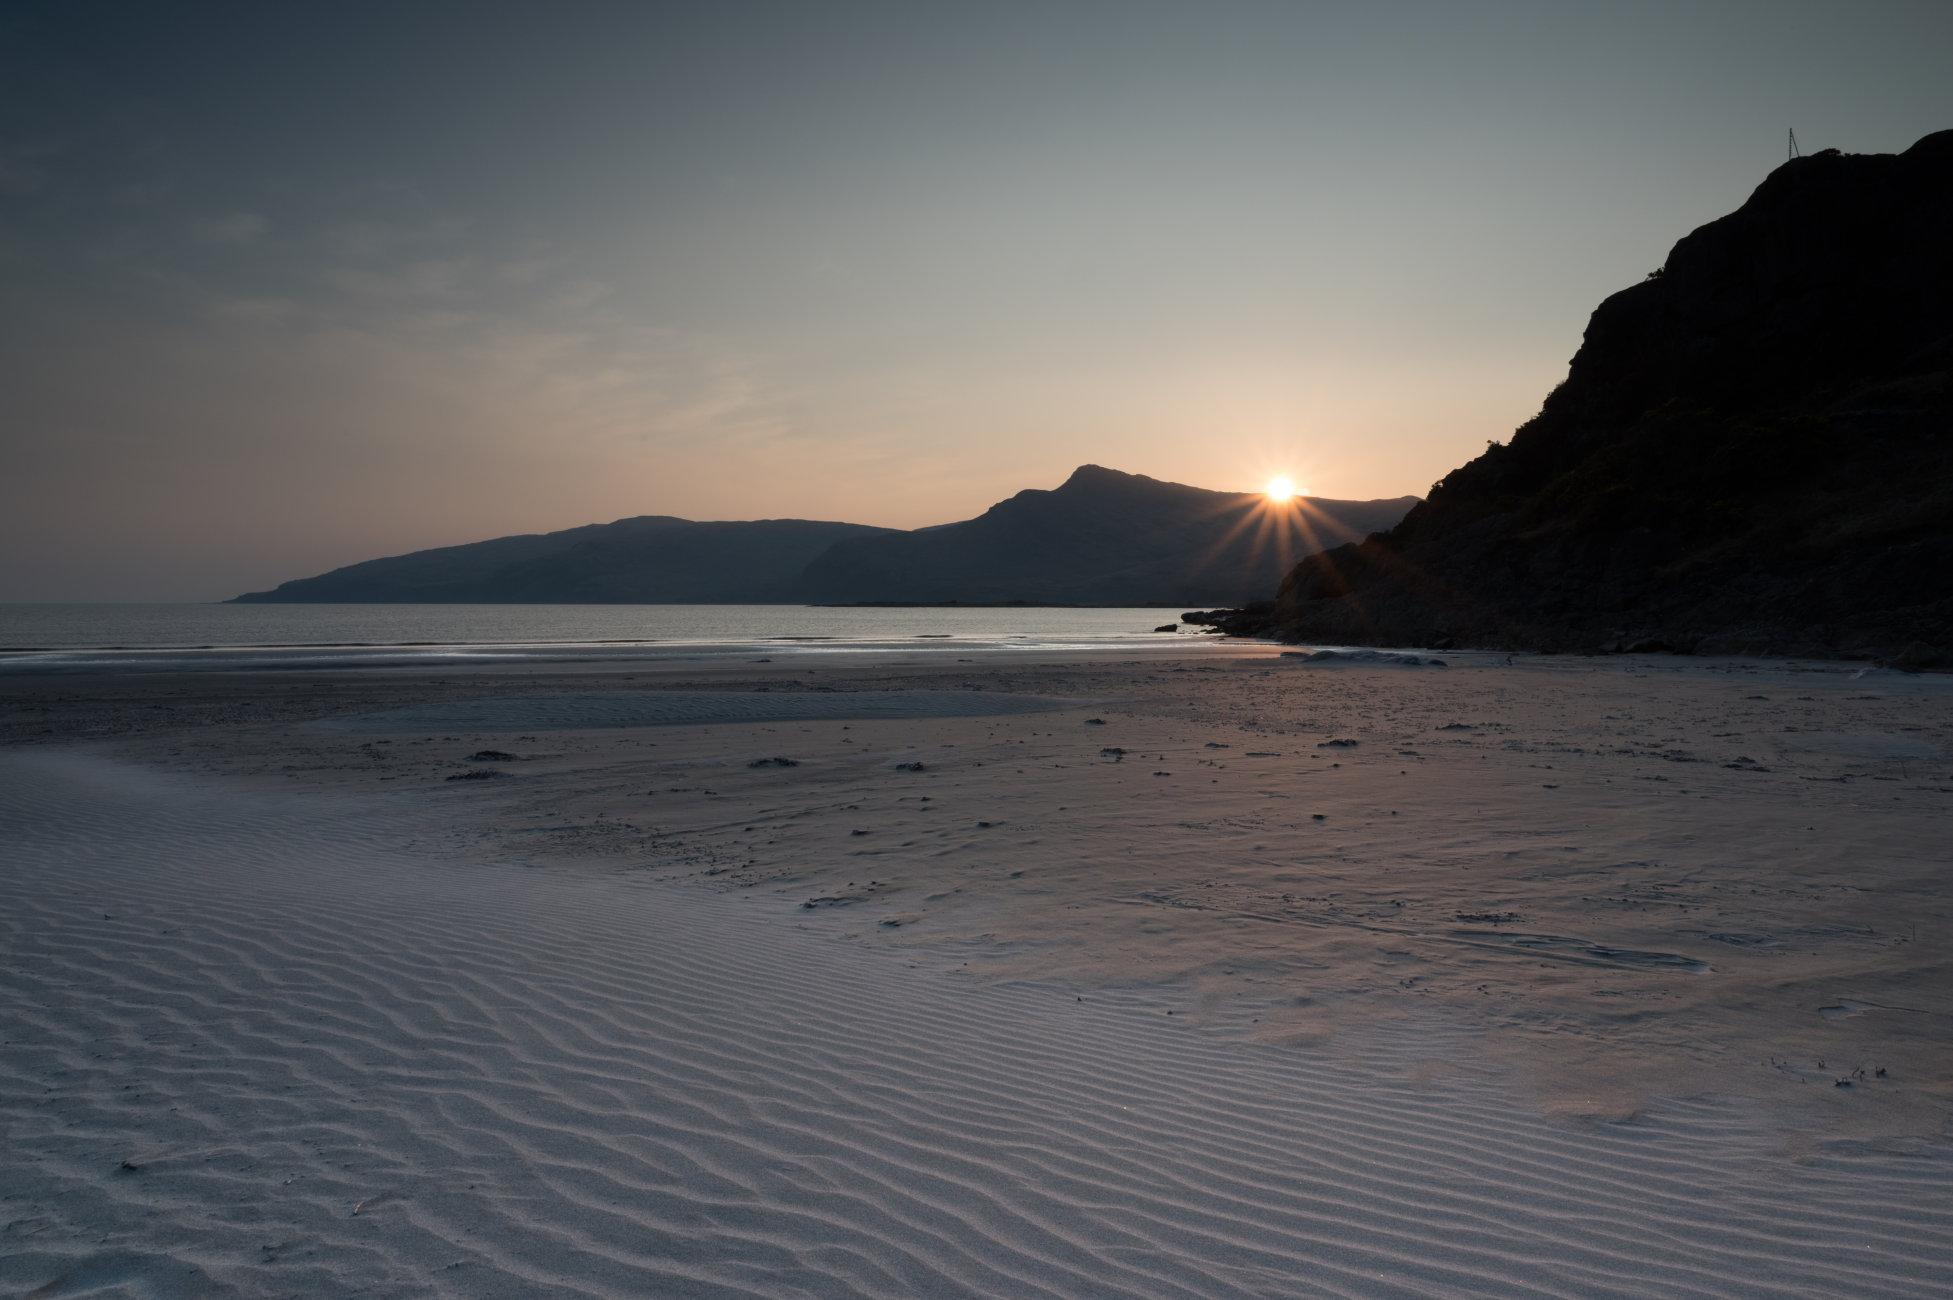 Beach starburst sunset